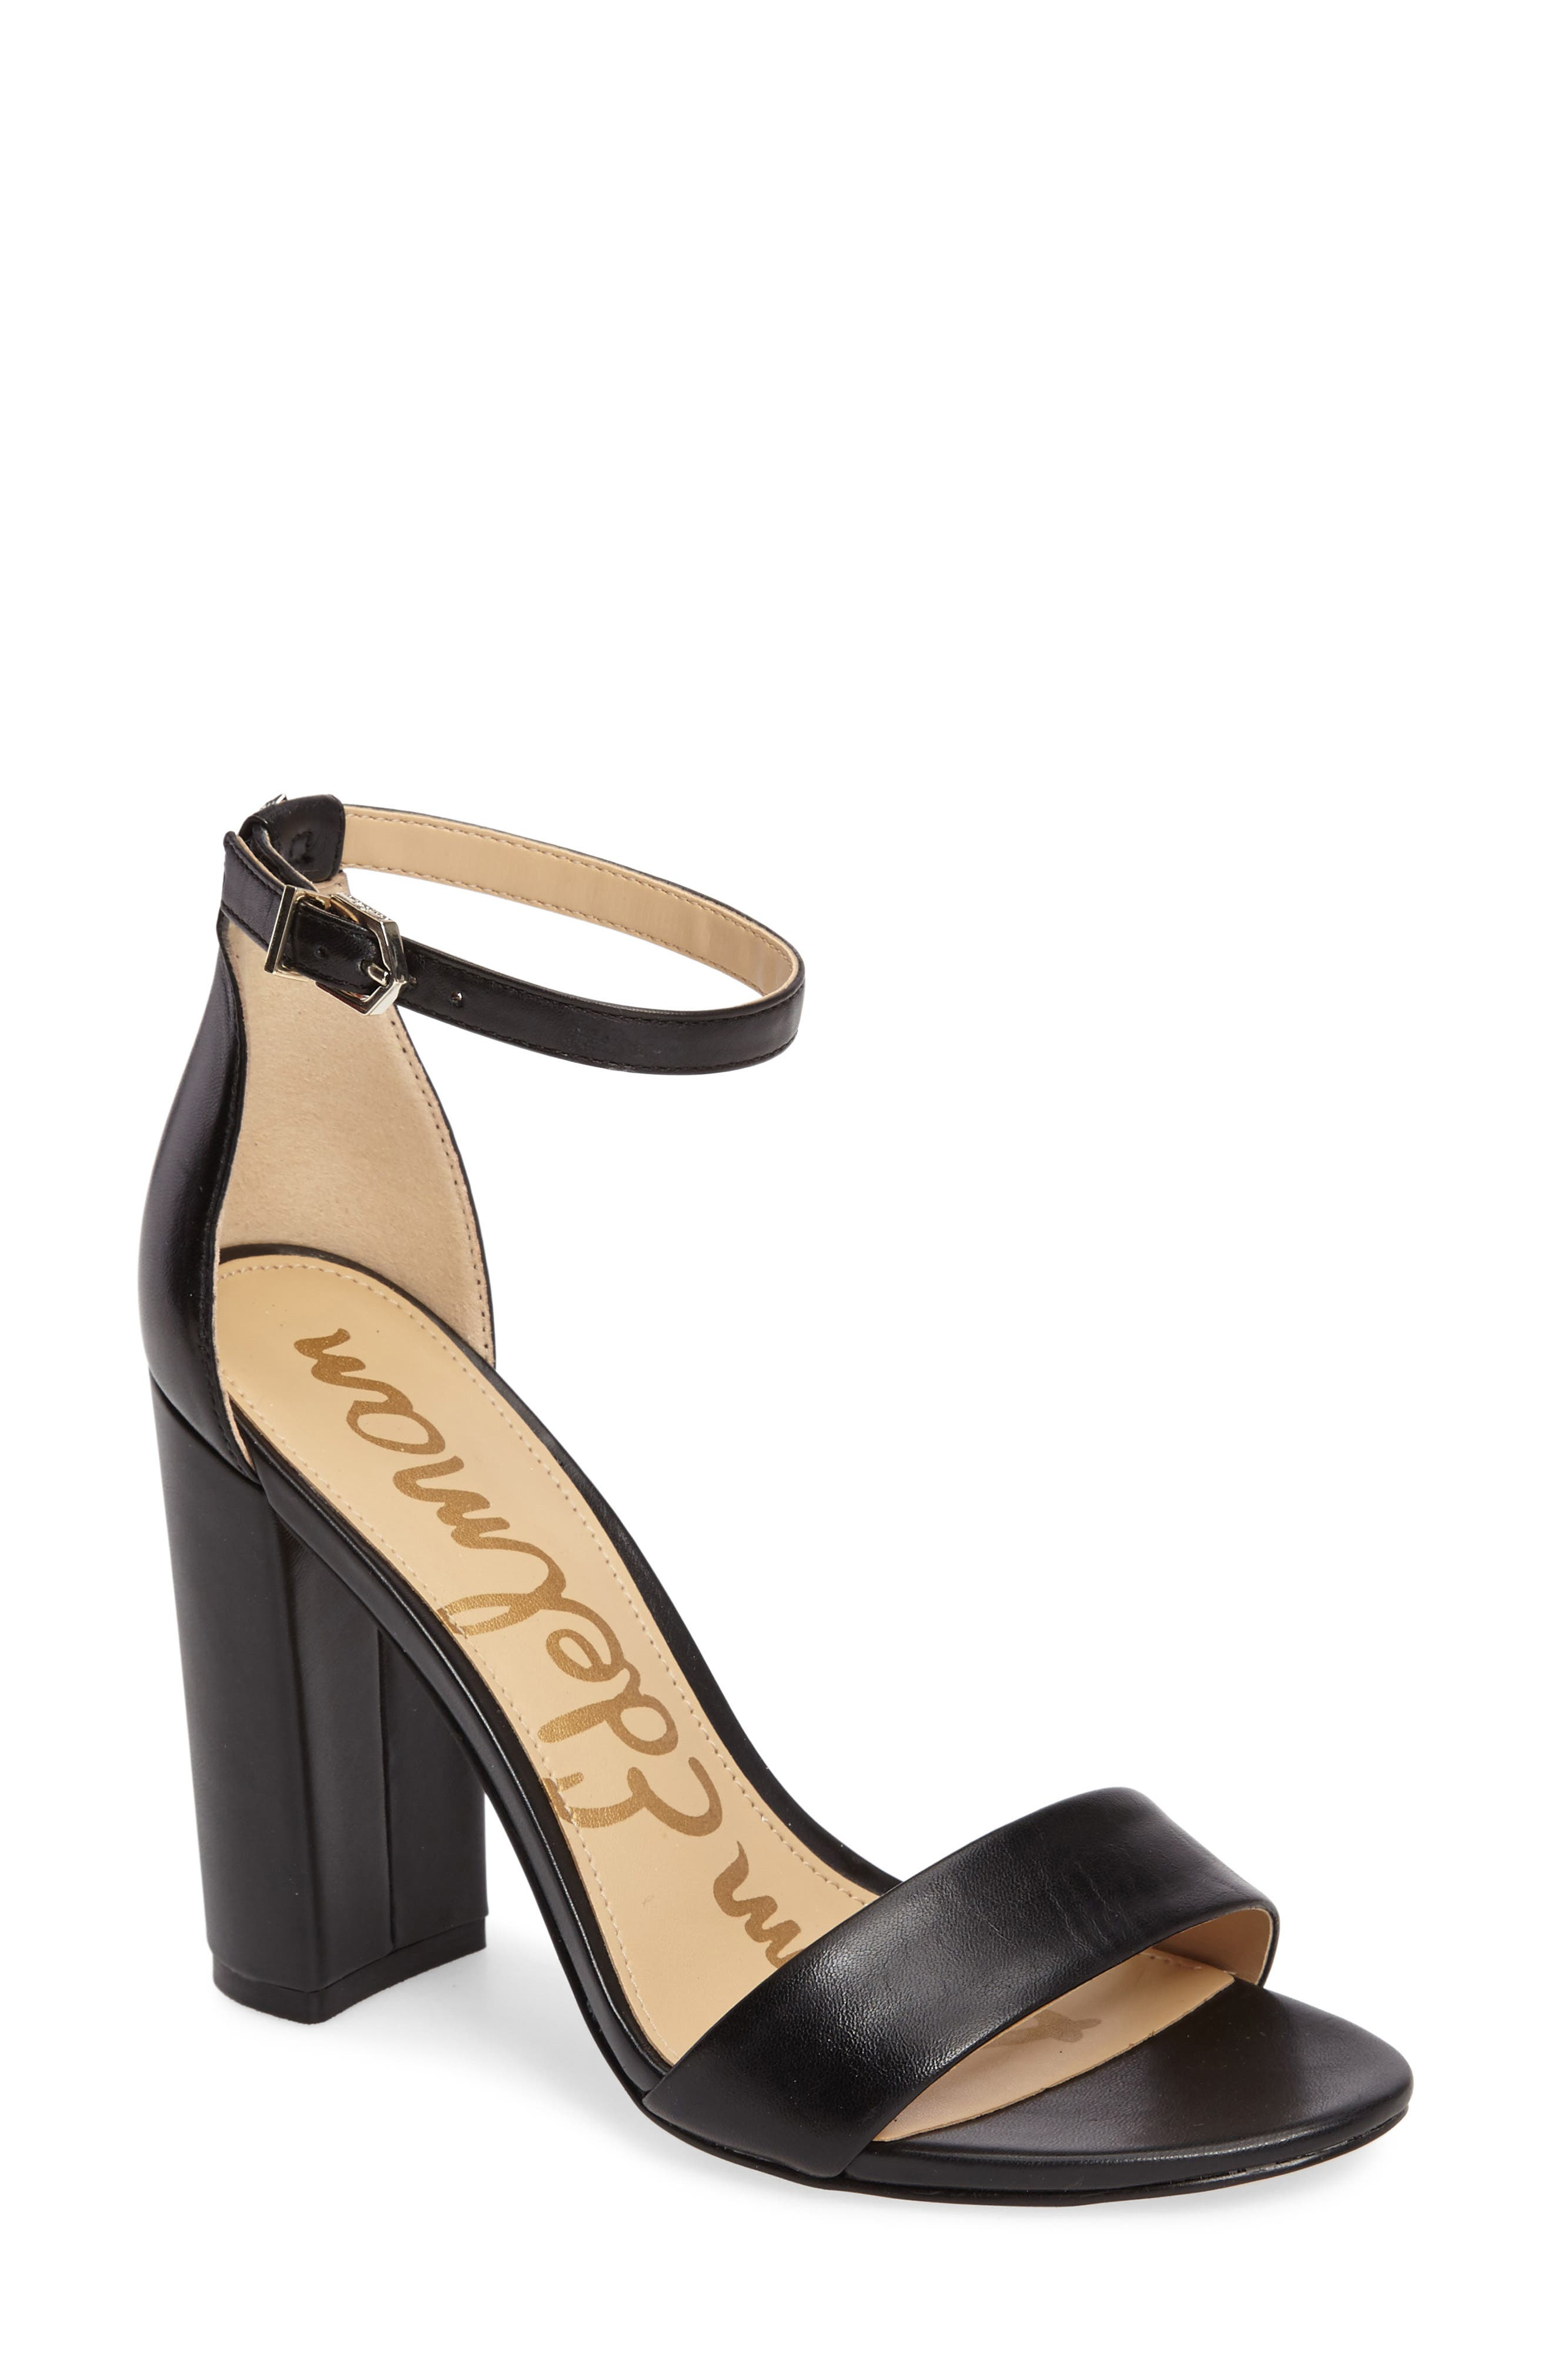 Yaro Ankle Strap Block Heel Sandals in Black Nappa Leather